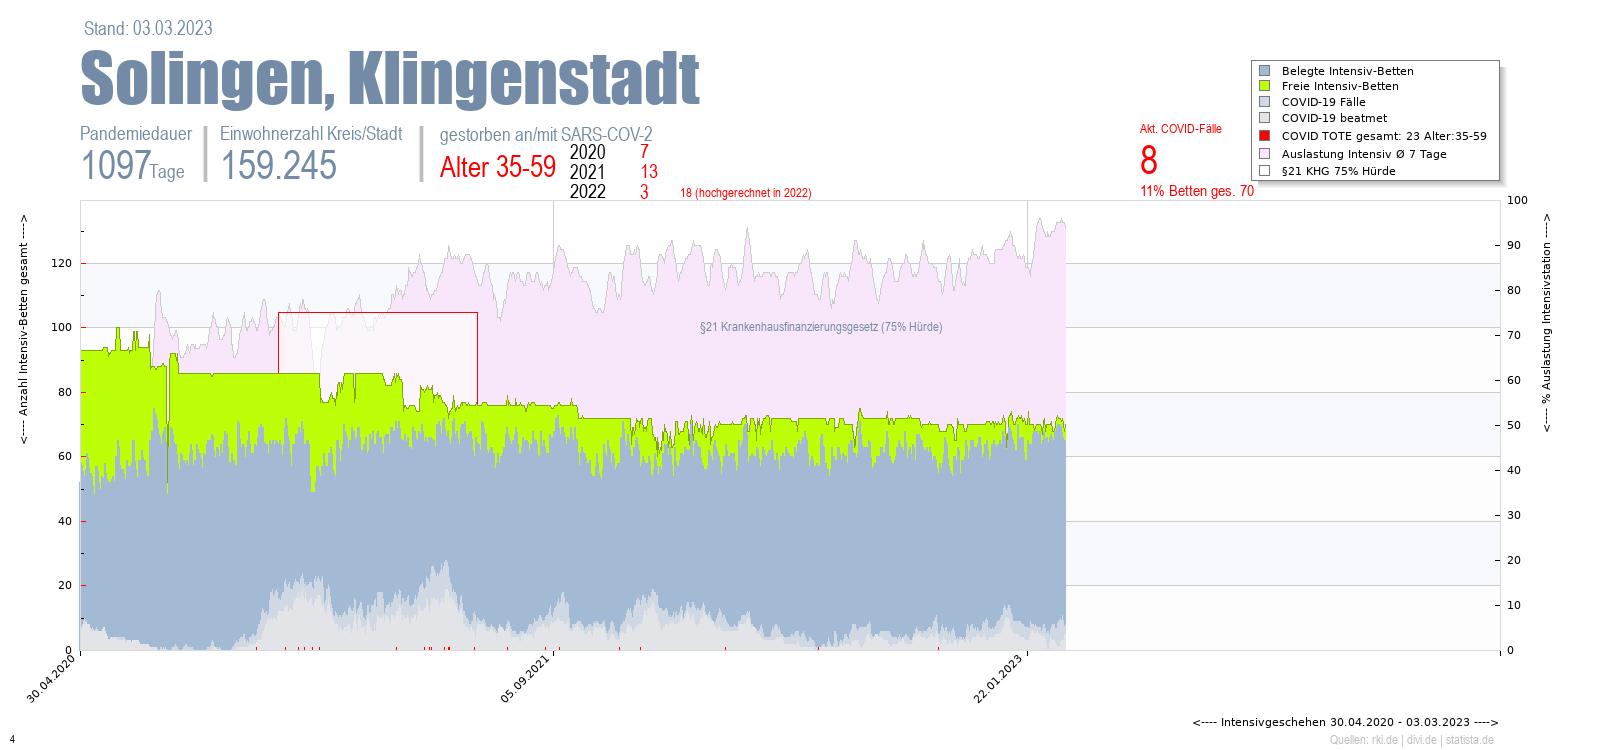 Intensivstation Auslastung Solingen, Klingenstadt Alter 0-4